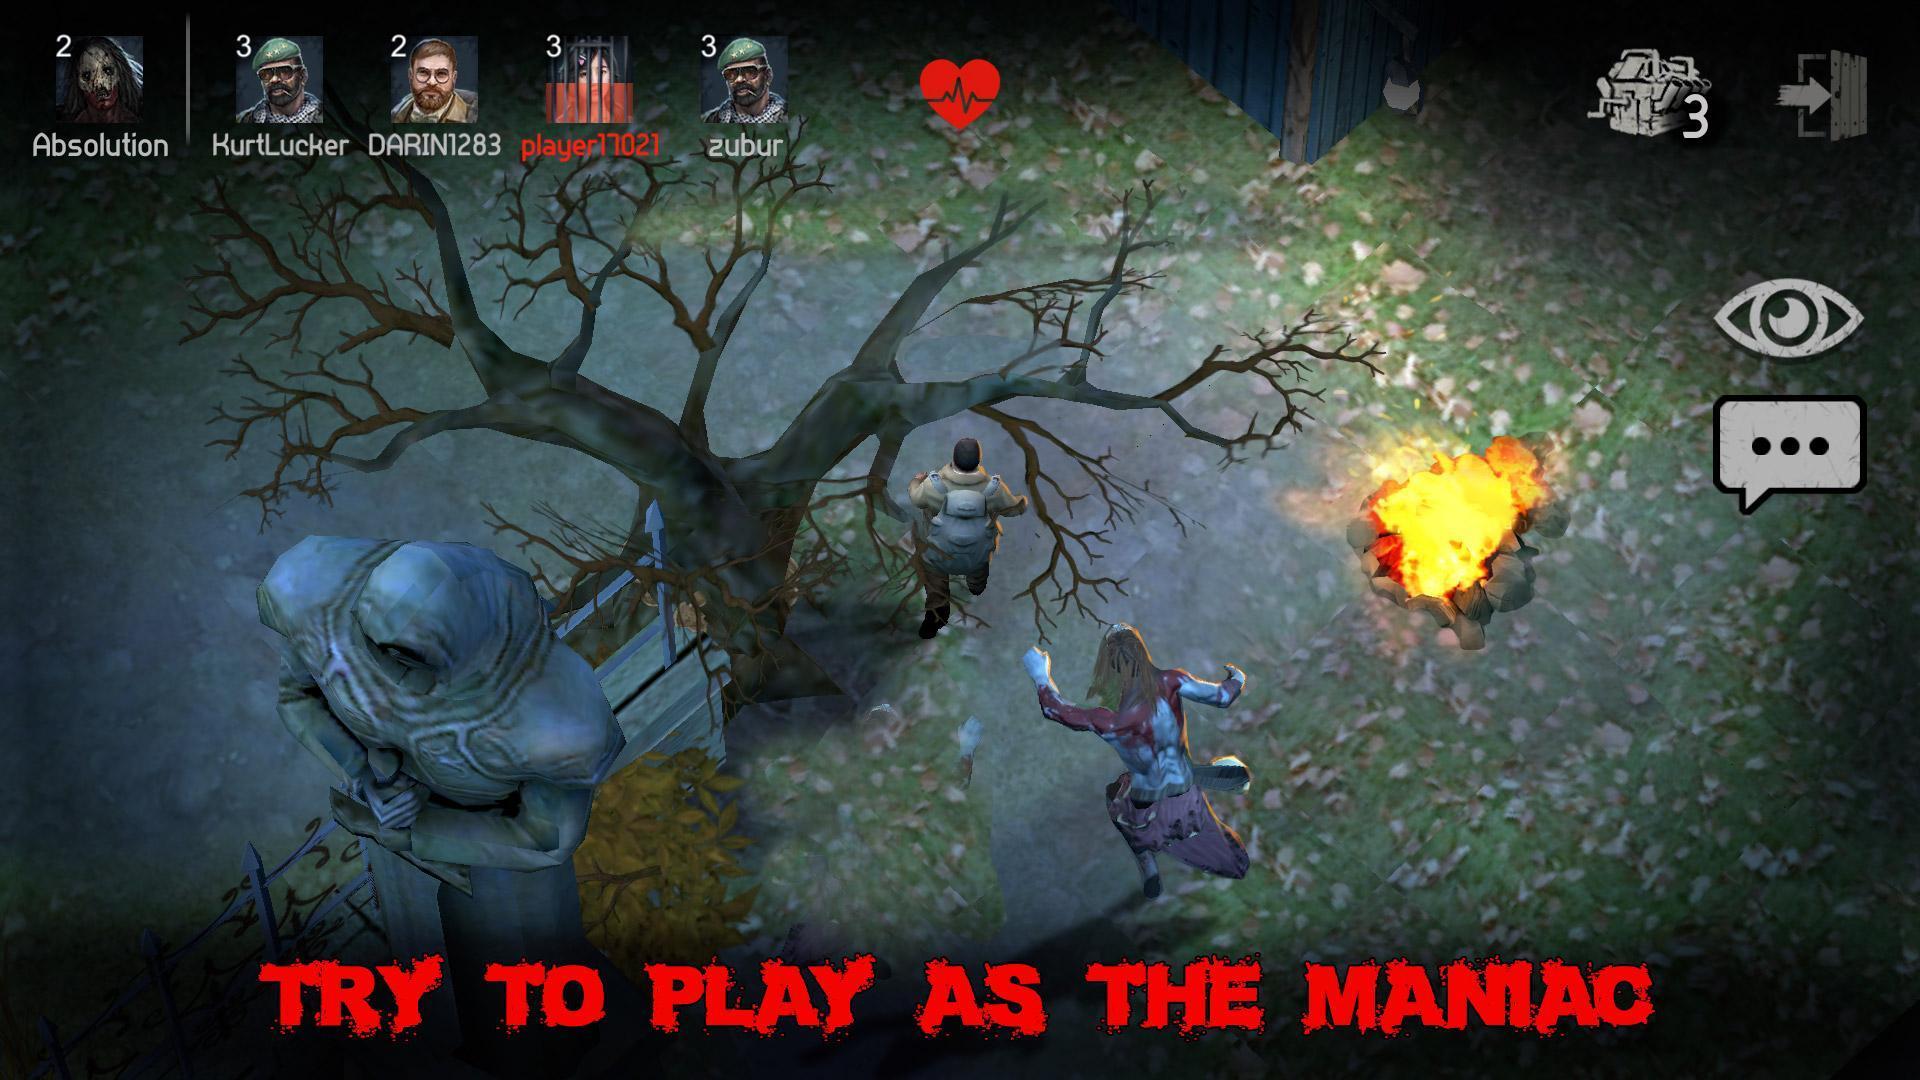 Horrorfield Multiplayer Survival Horror Game 1.3.6 Screenshot 18